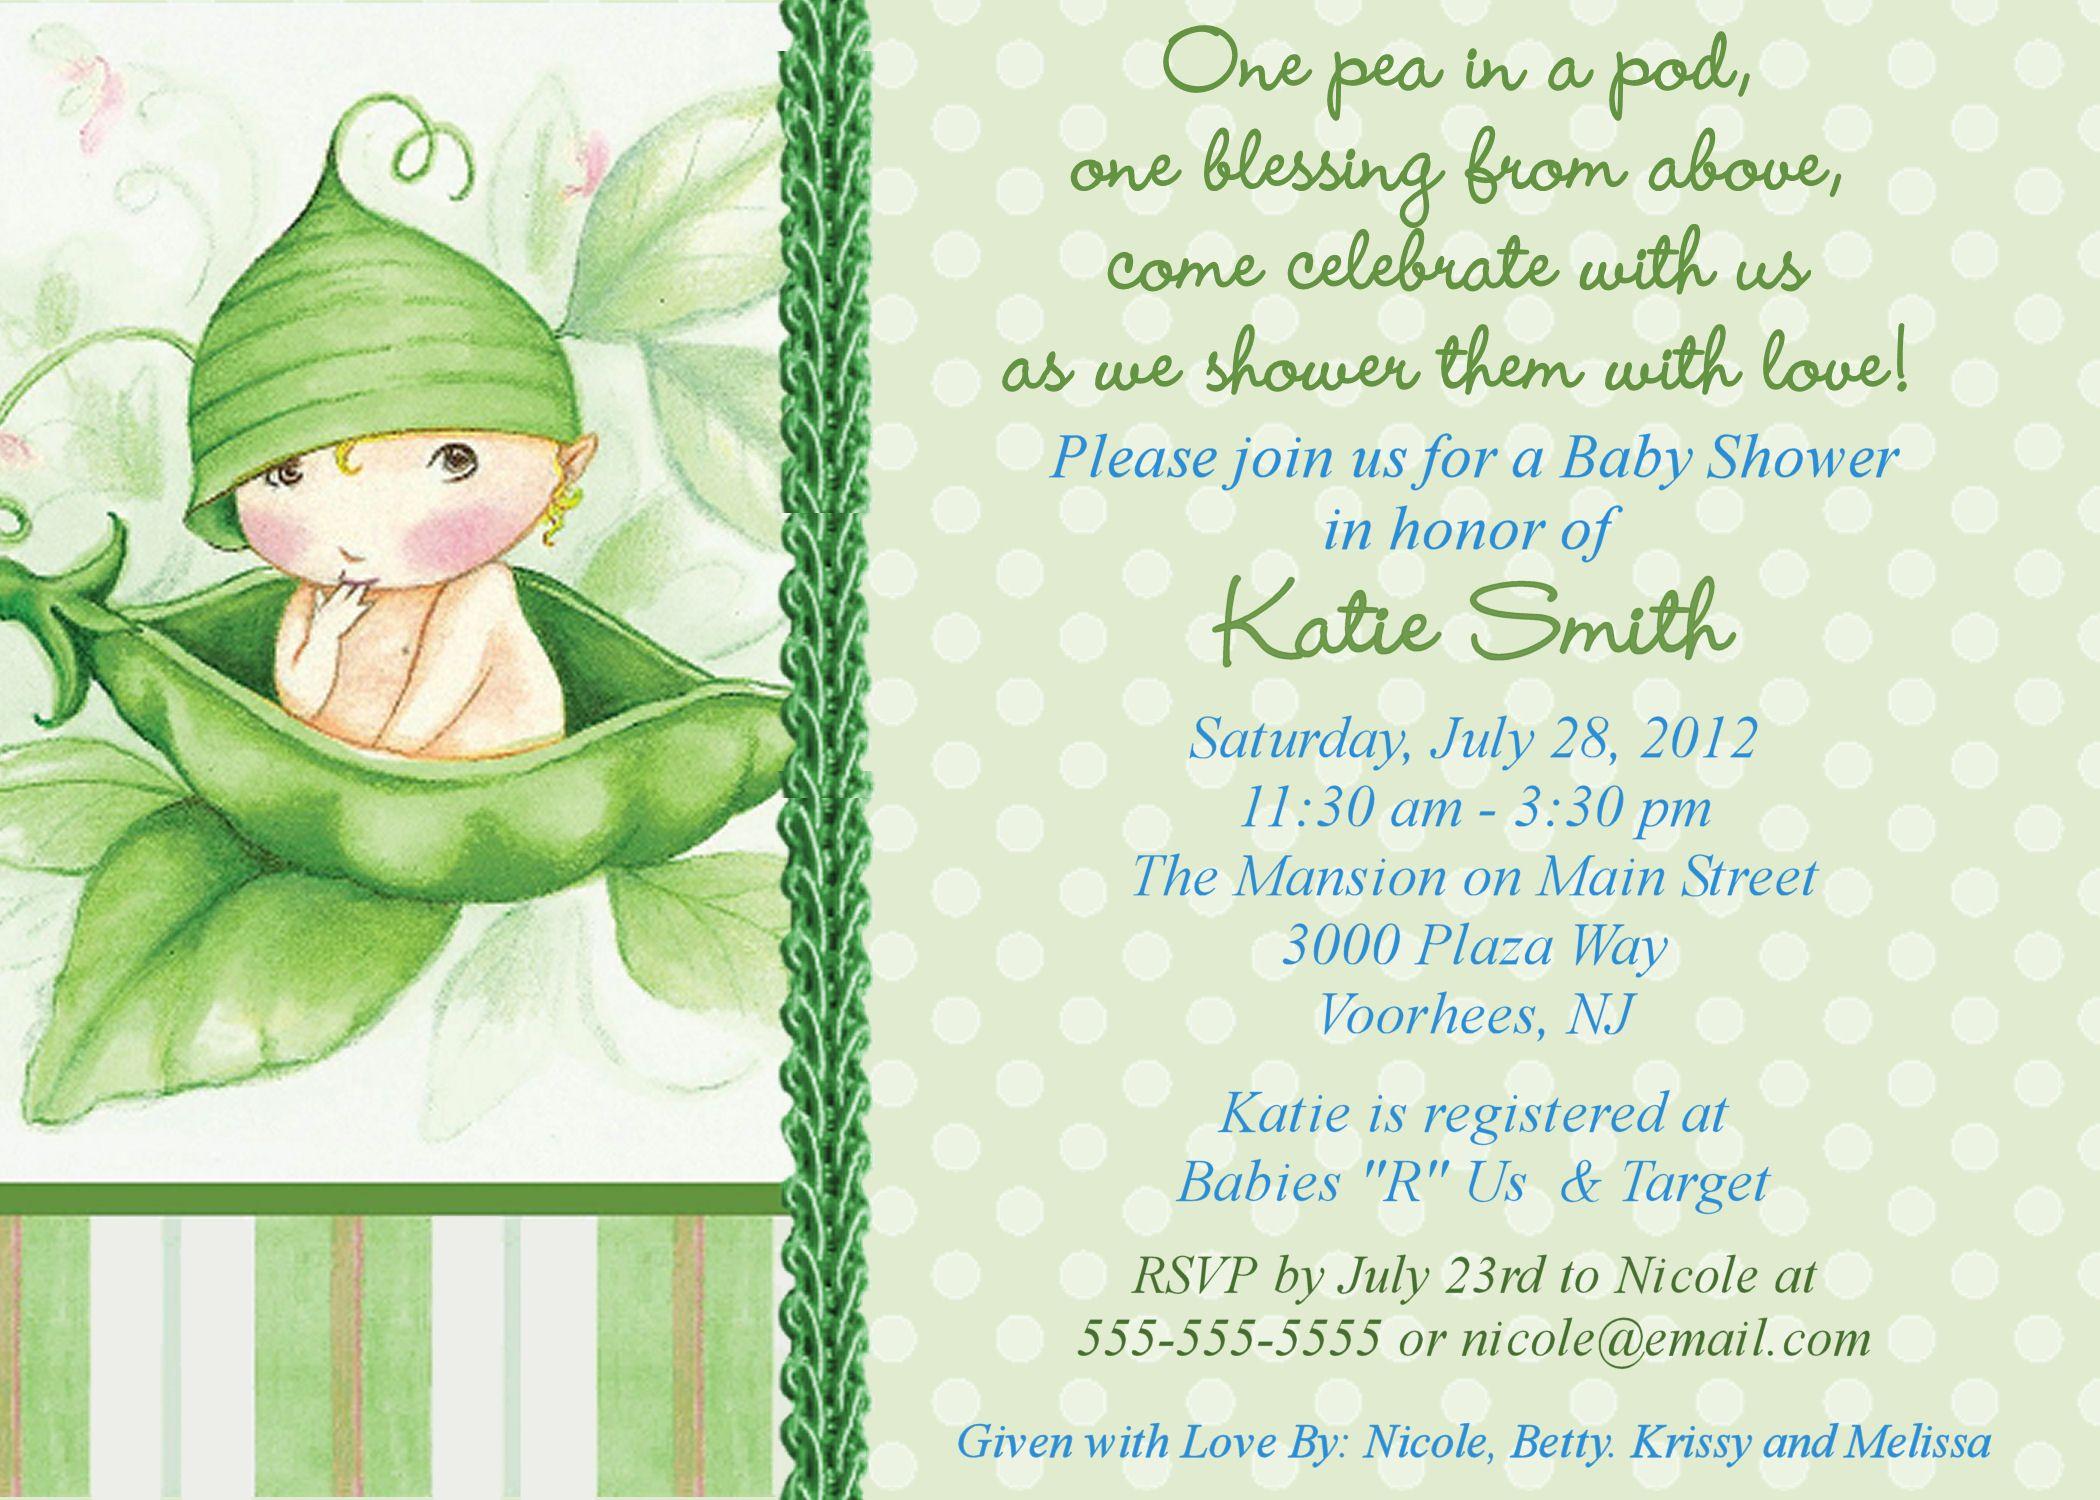 Baby Shower Invitation Sample Invitation Templates Baby Shower Invitation Cards Sprinkle Baby Shower Invitations Owl Baby Shower Invitations